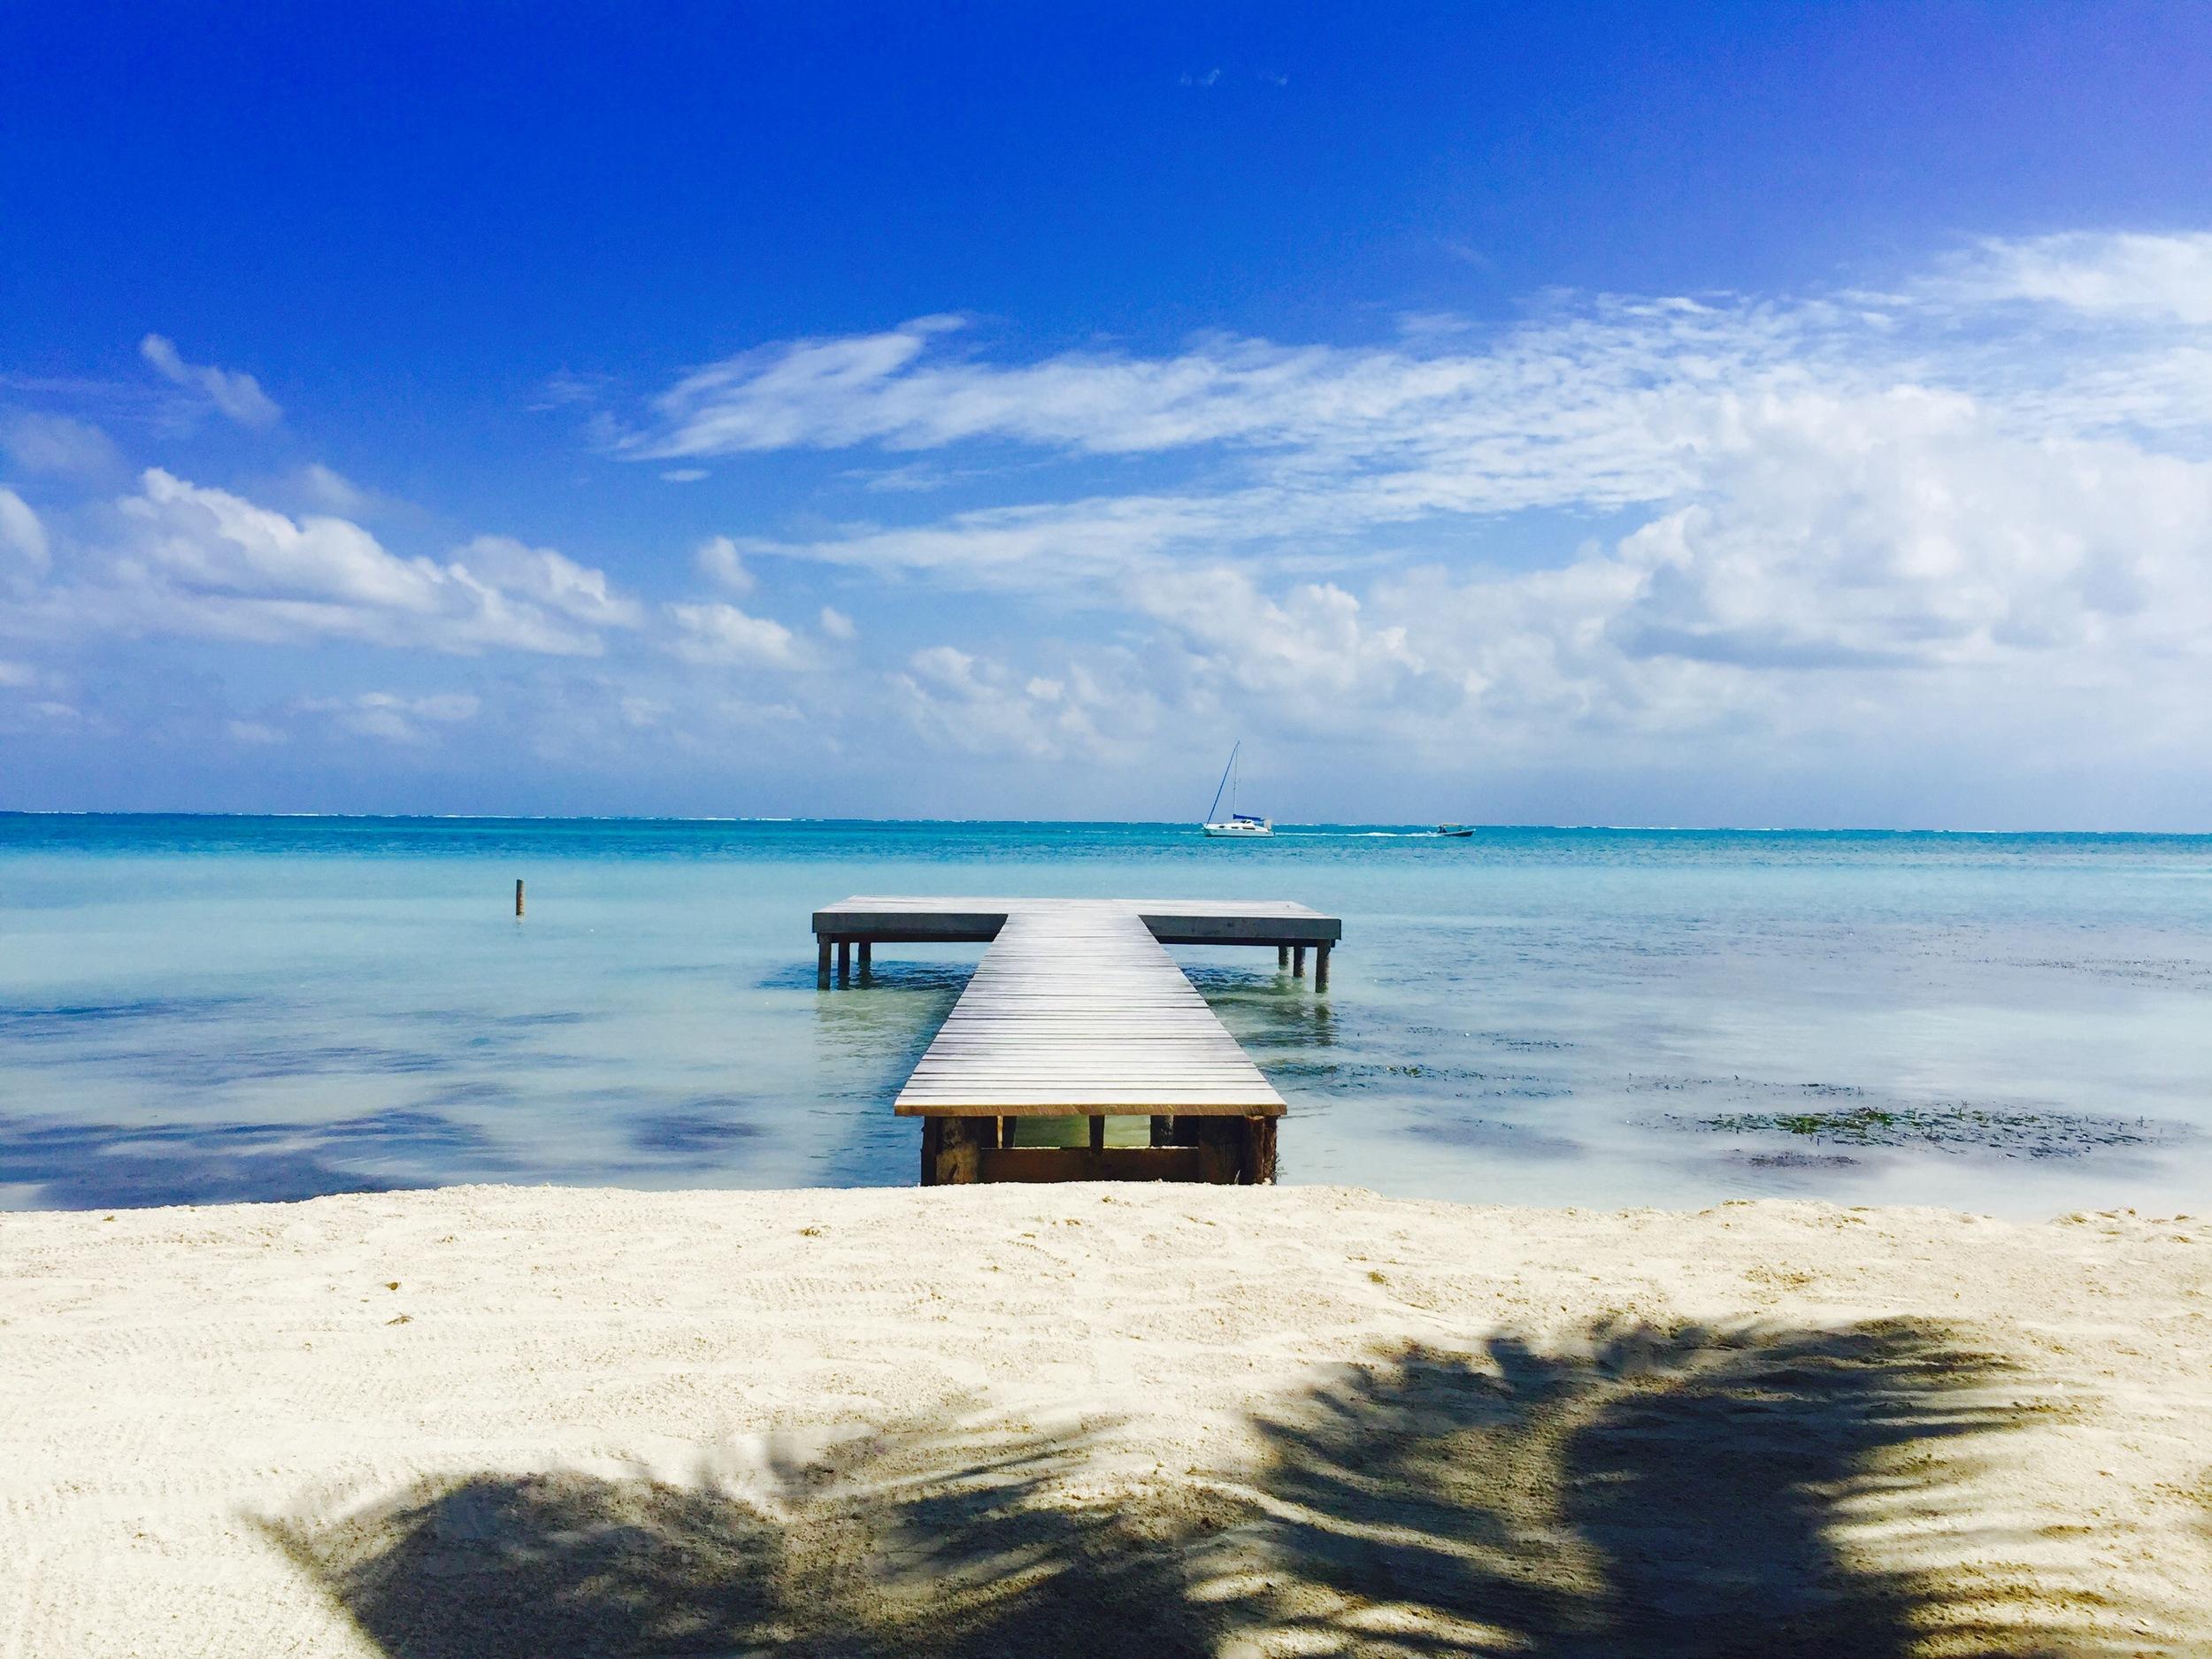 Belize_Caye Caulker.jpg